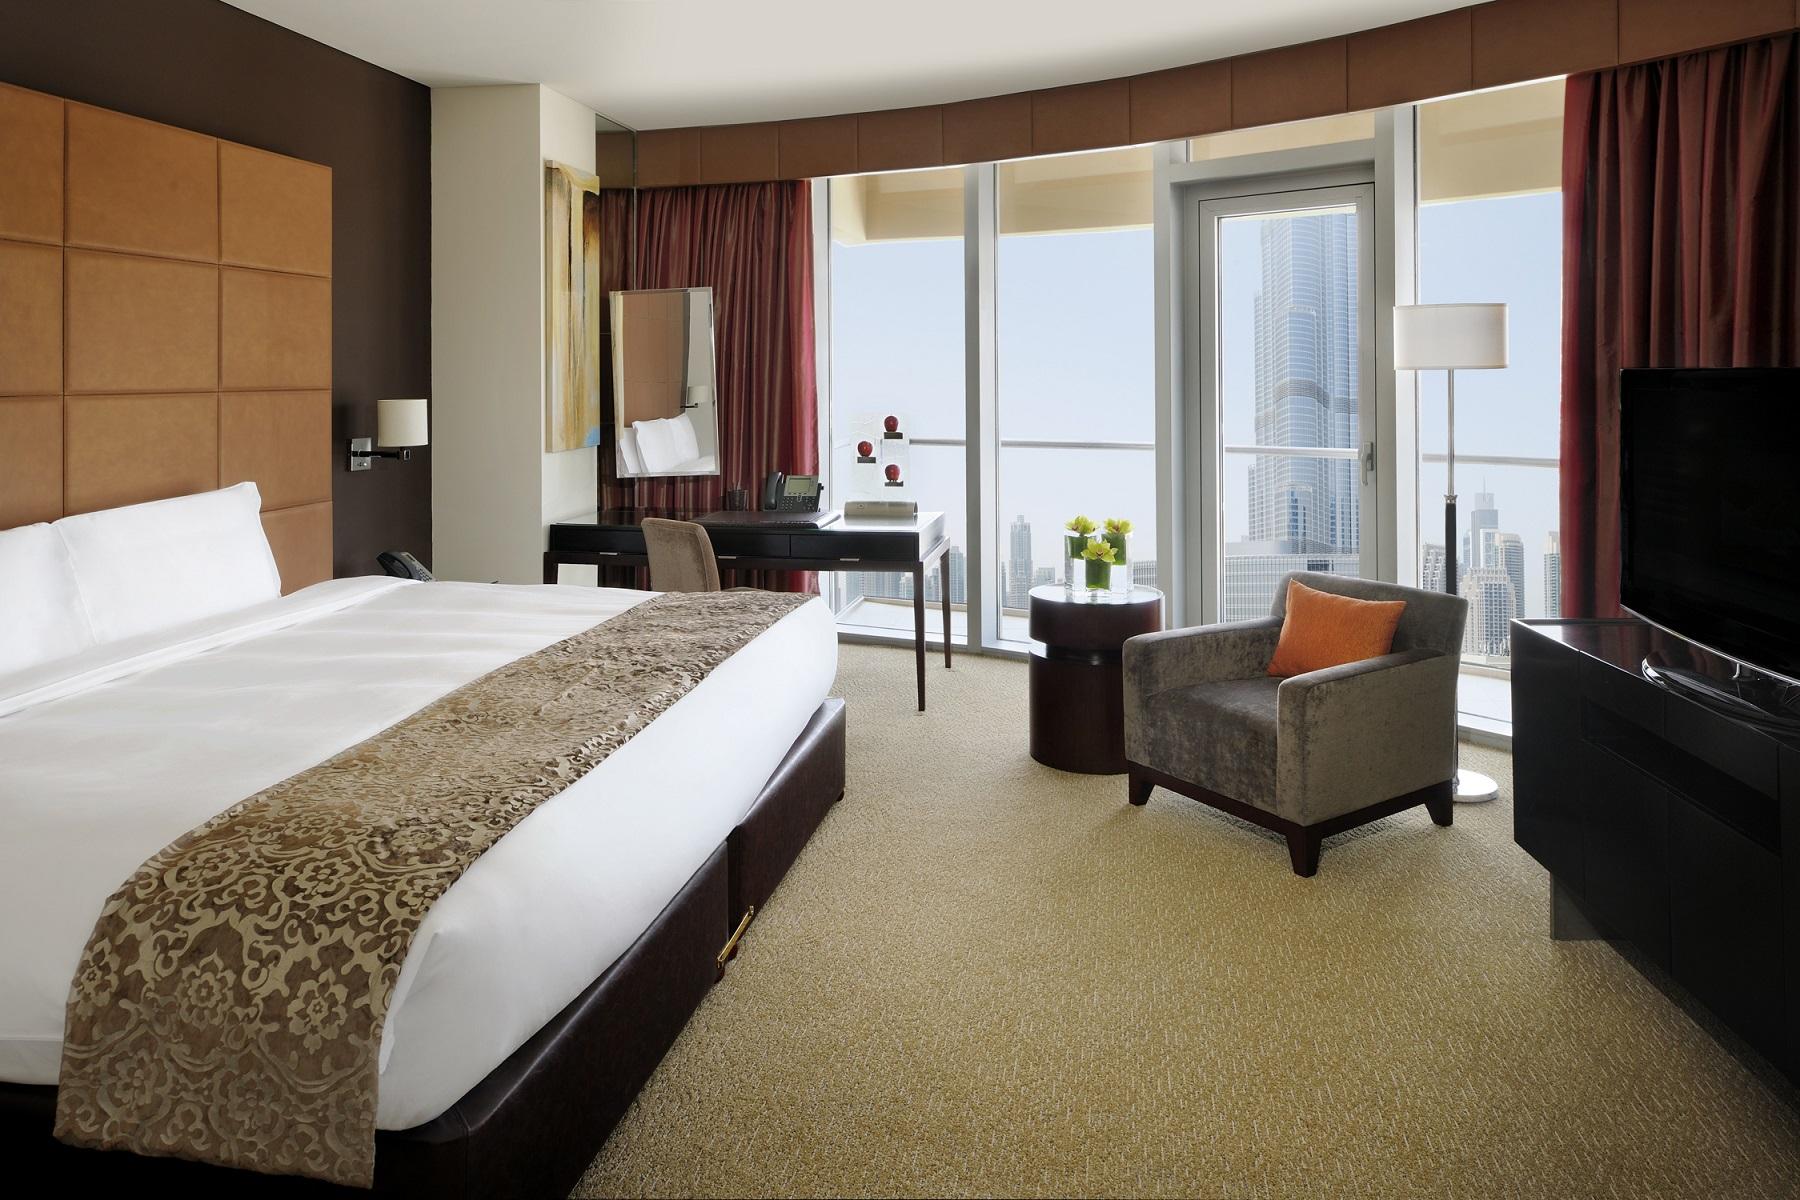 Celebrate togetherness at address hotels resorts Dubai burj khalifa rooms